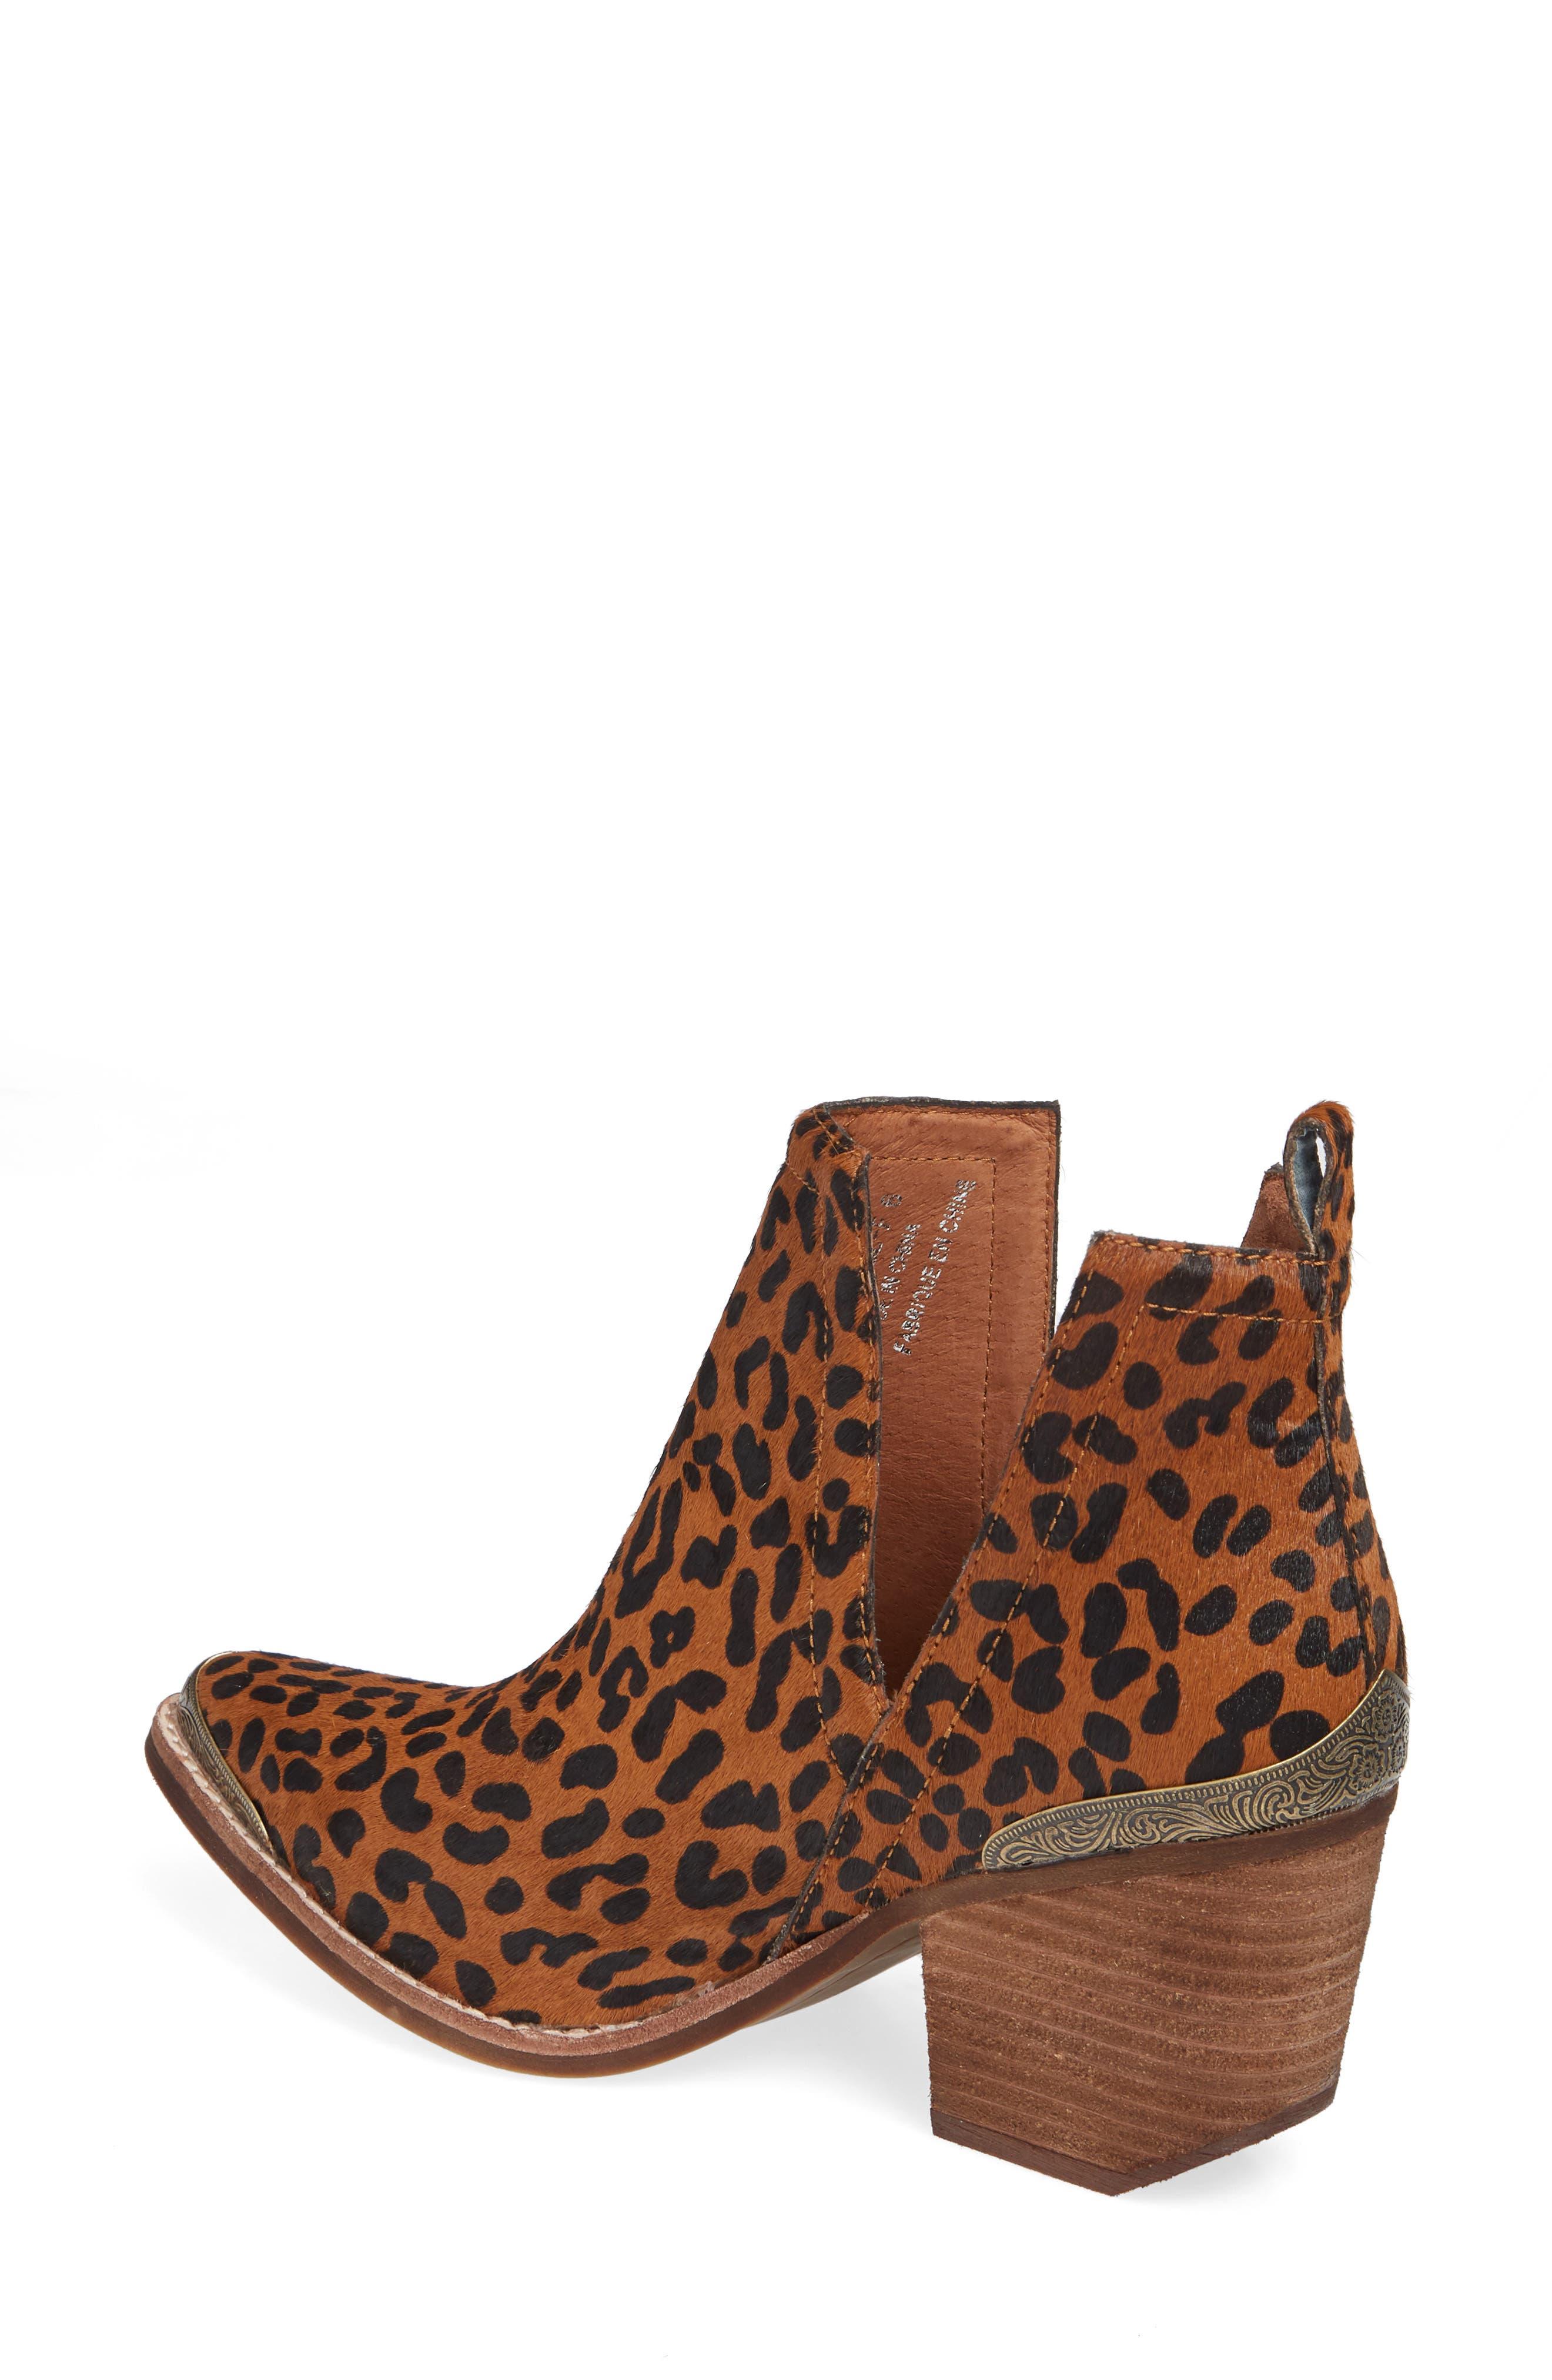 JEFFREY CAMPBELL, Cromwell Cutout Genuine Calf Hair Western Boot, Alternate thumbnail 2, color, BROWN CHEETAH CALF HAIR